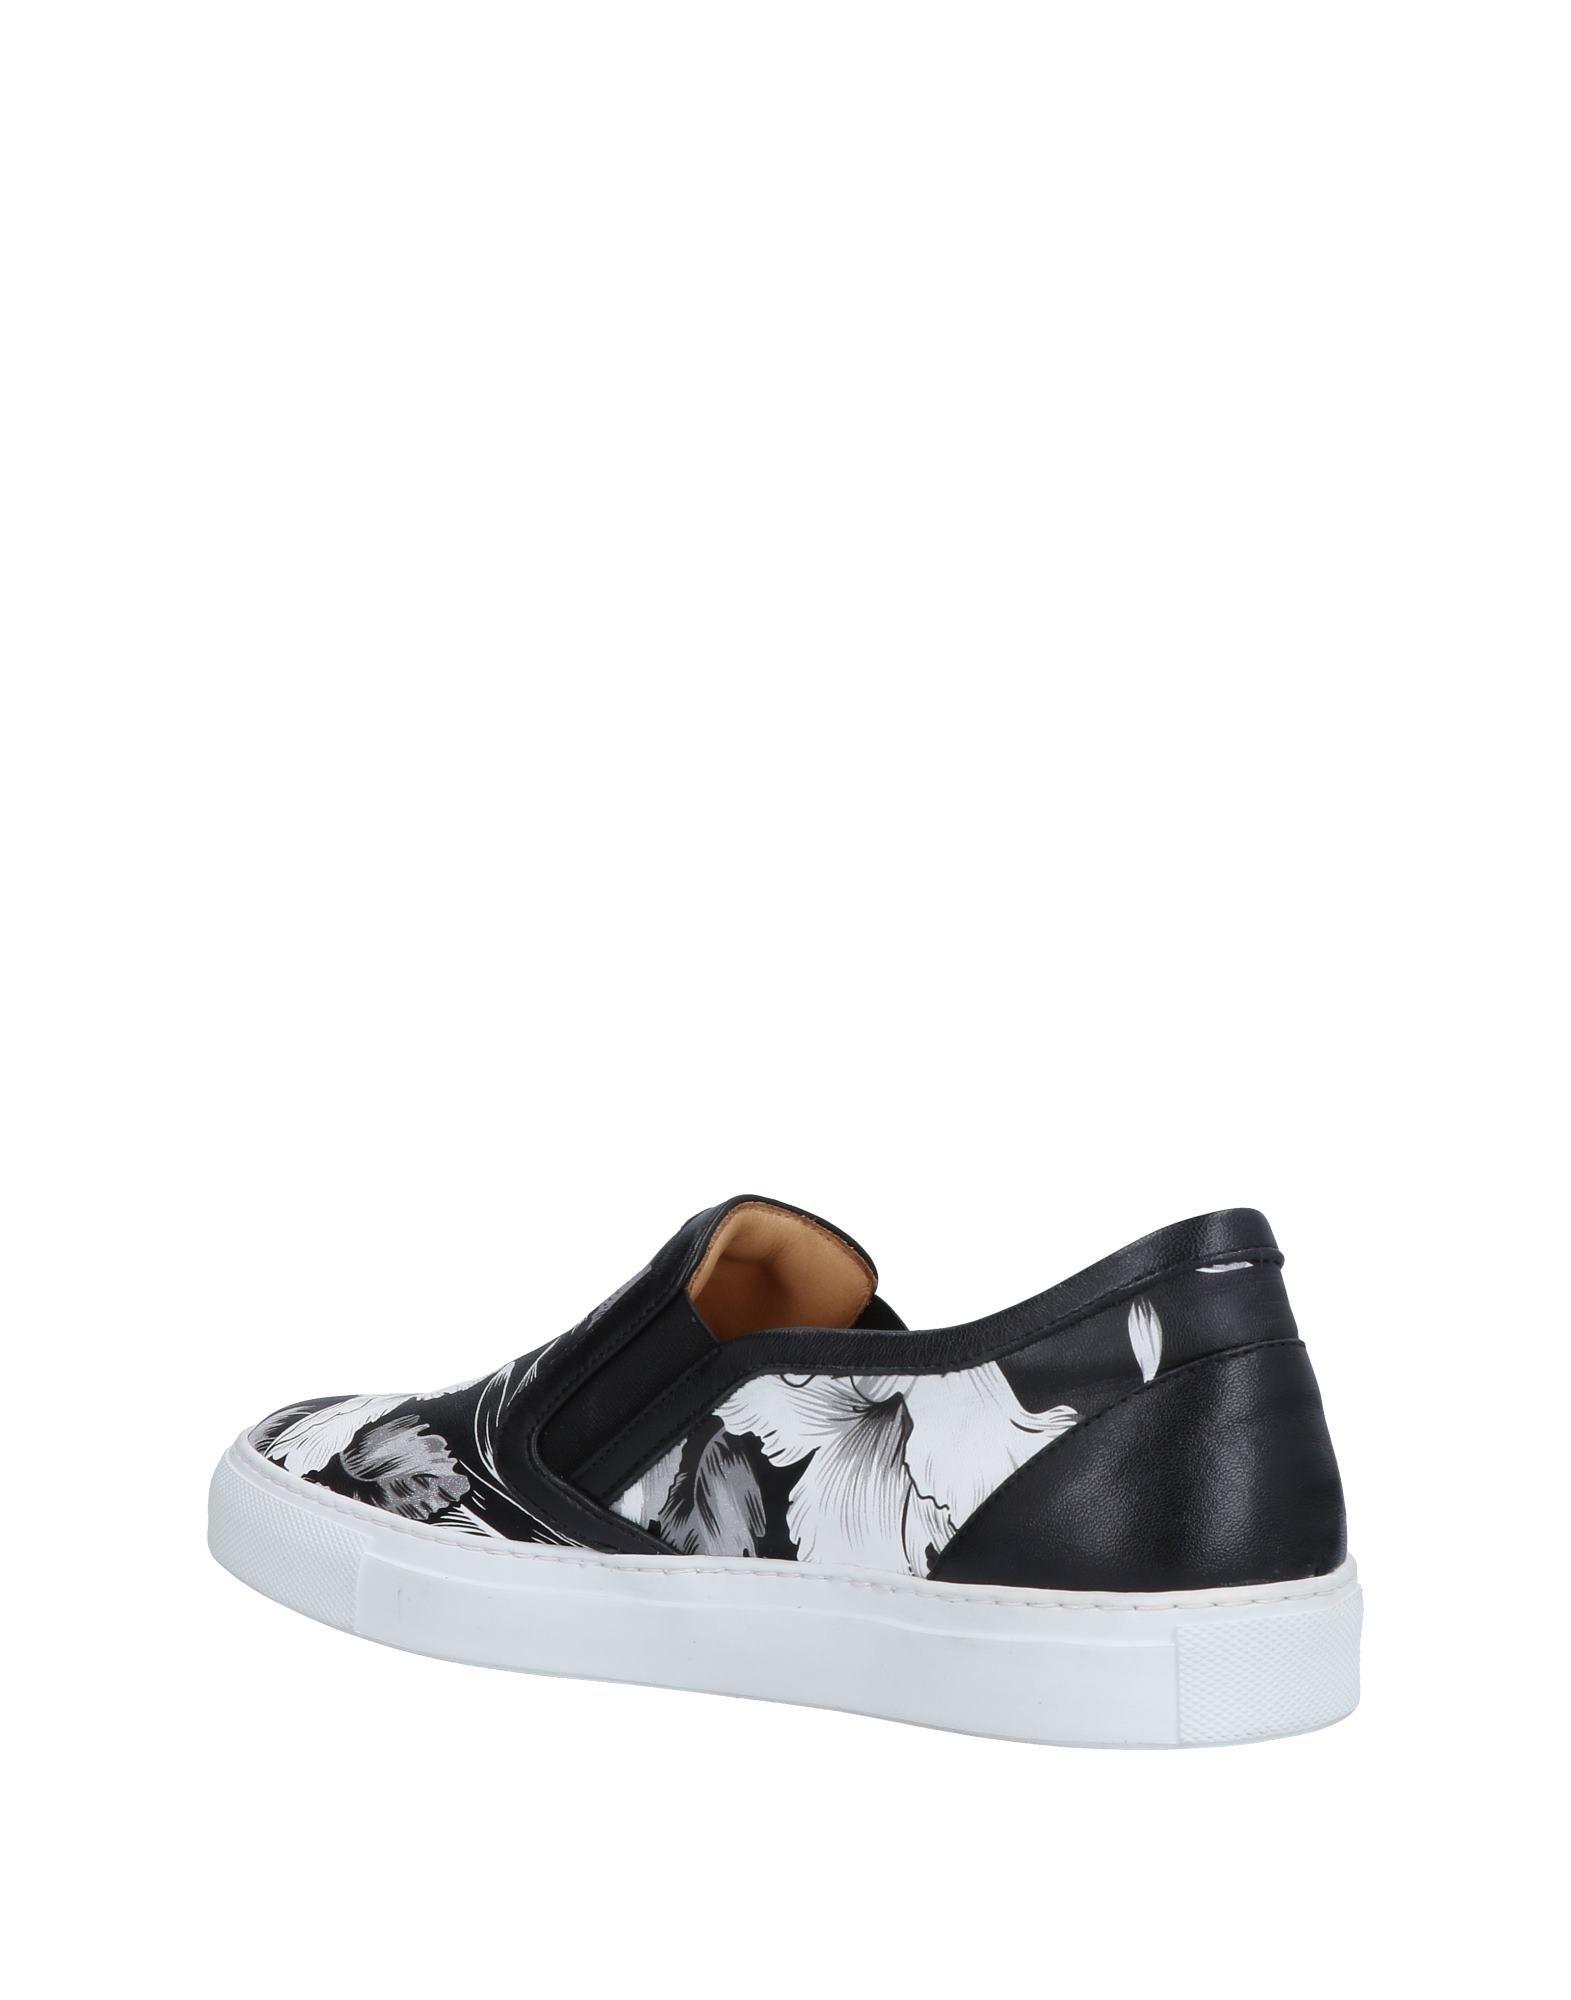 Gut Lauri um billige Schuhe zu tragenOim By Silvana Lauri Gut Sneakers Damen  11504888BU fd6523